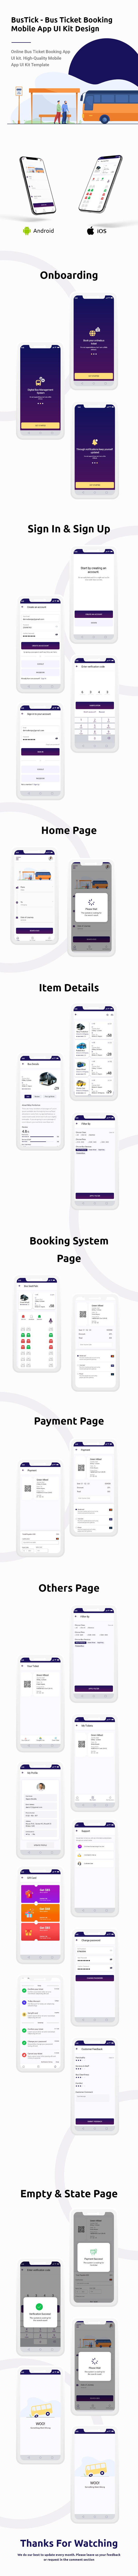 BusTick - Bus Booking Mobile UI Design - 3